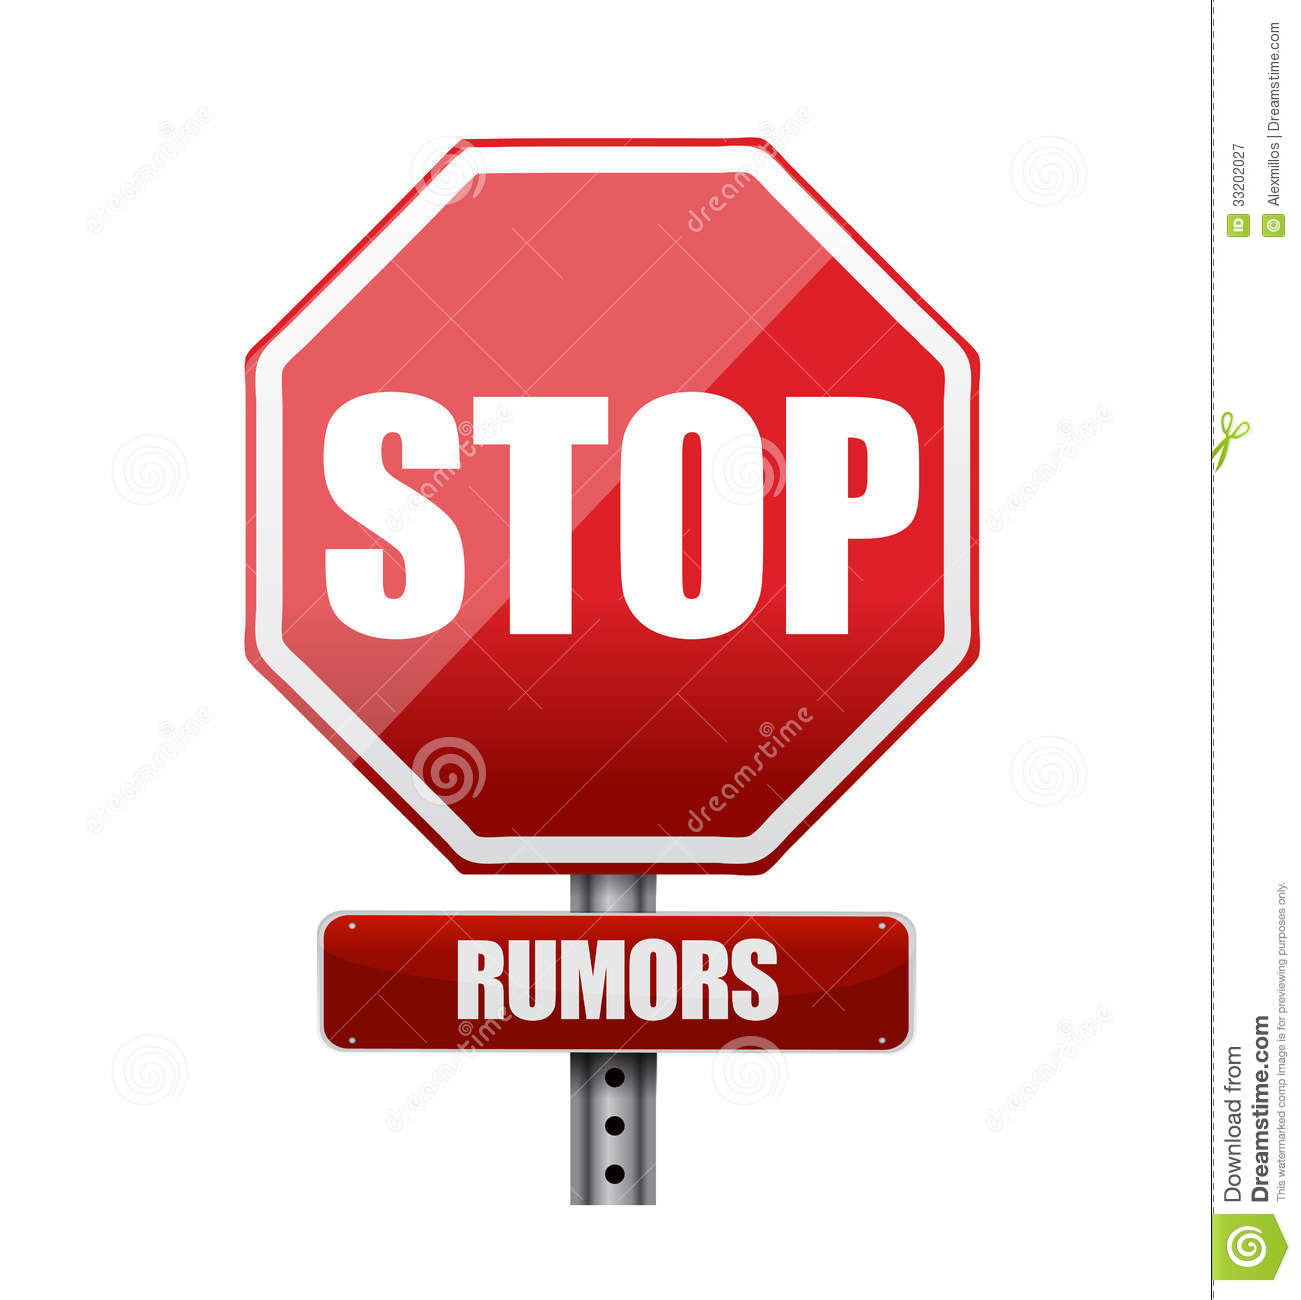 Rumor clipart.